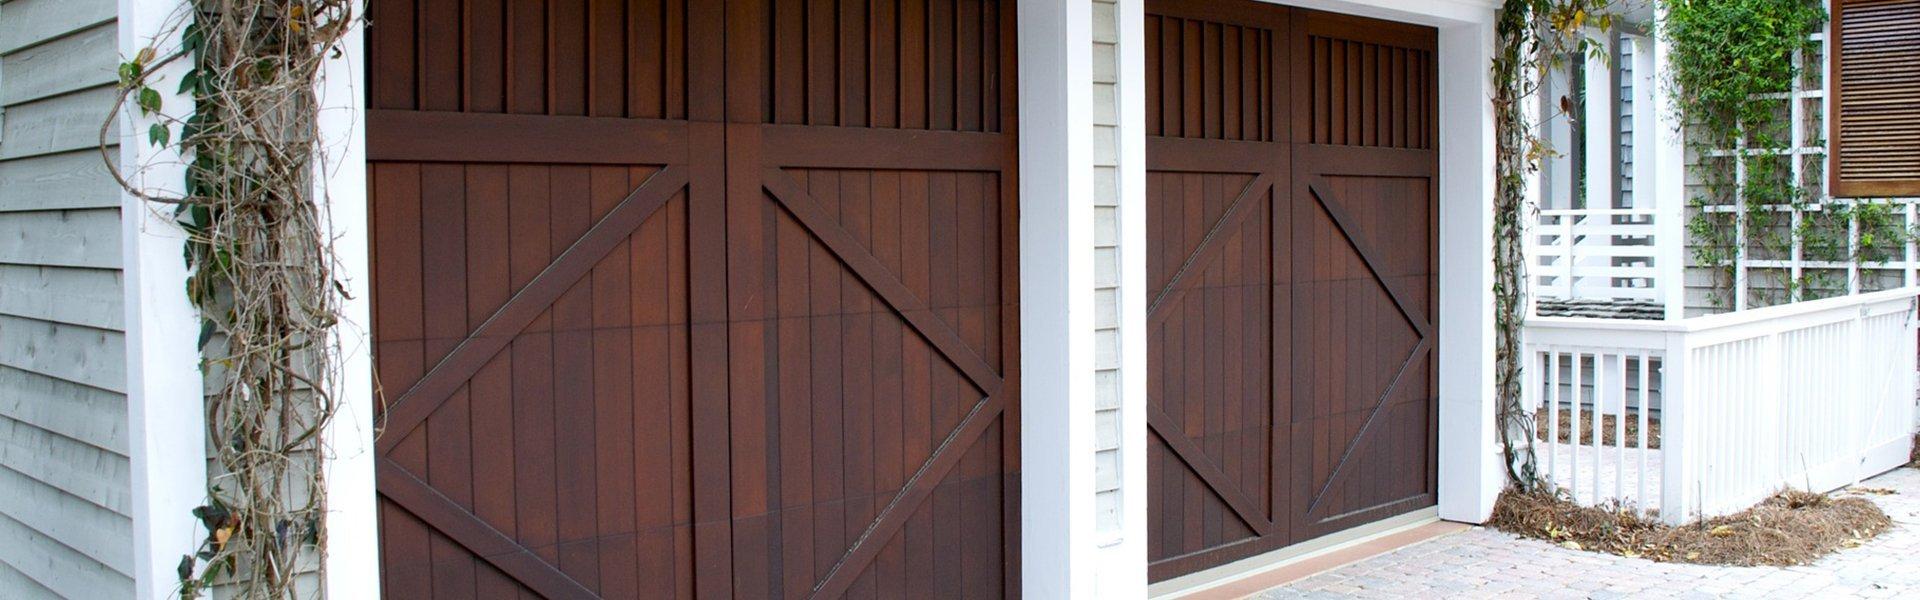 Maryland Garage Door Services